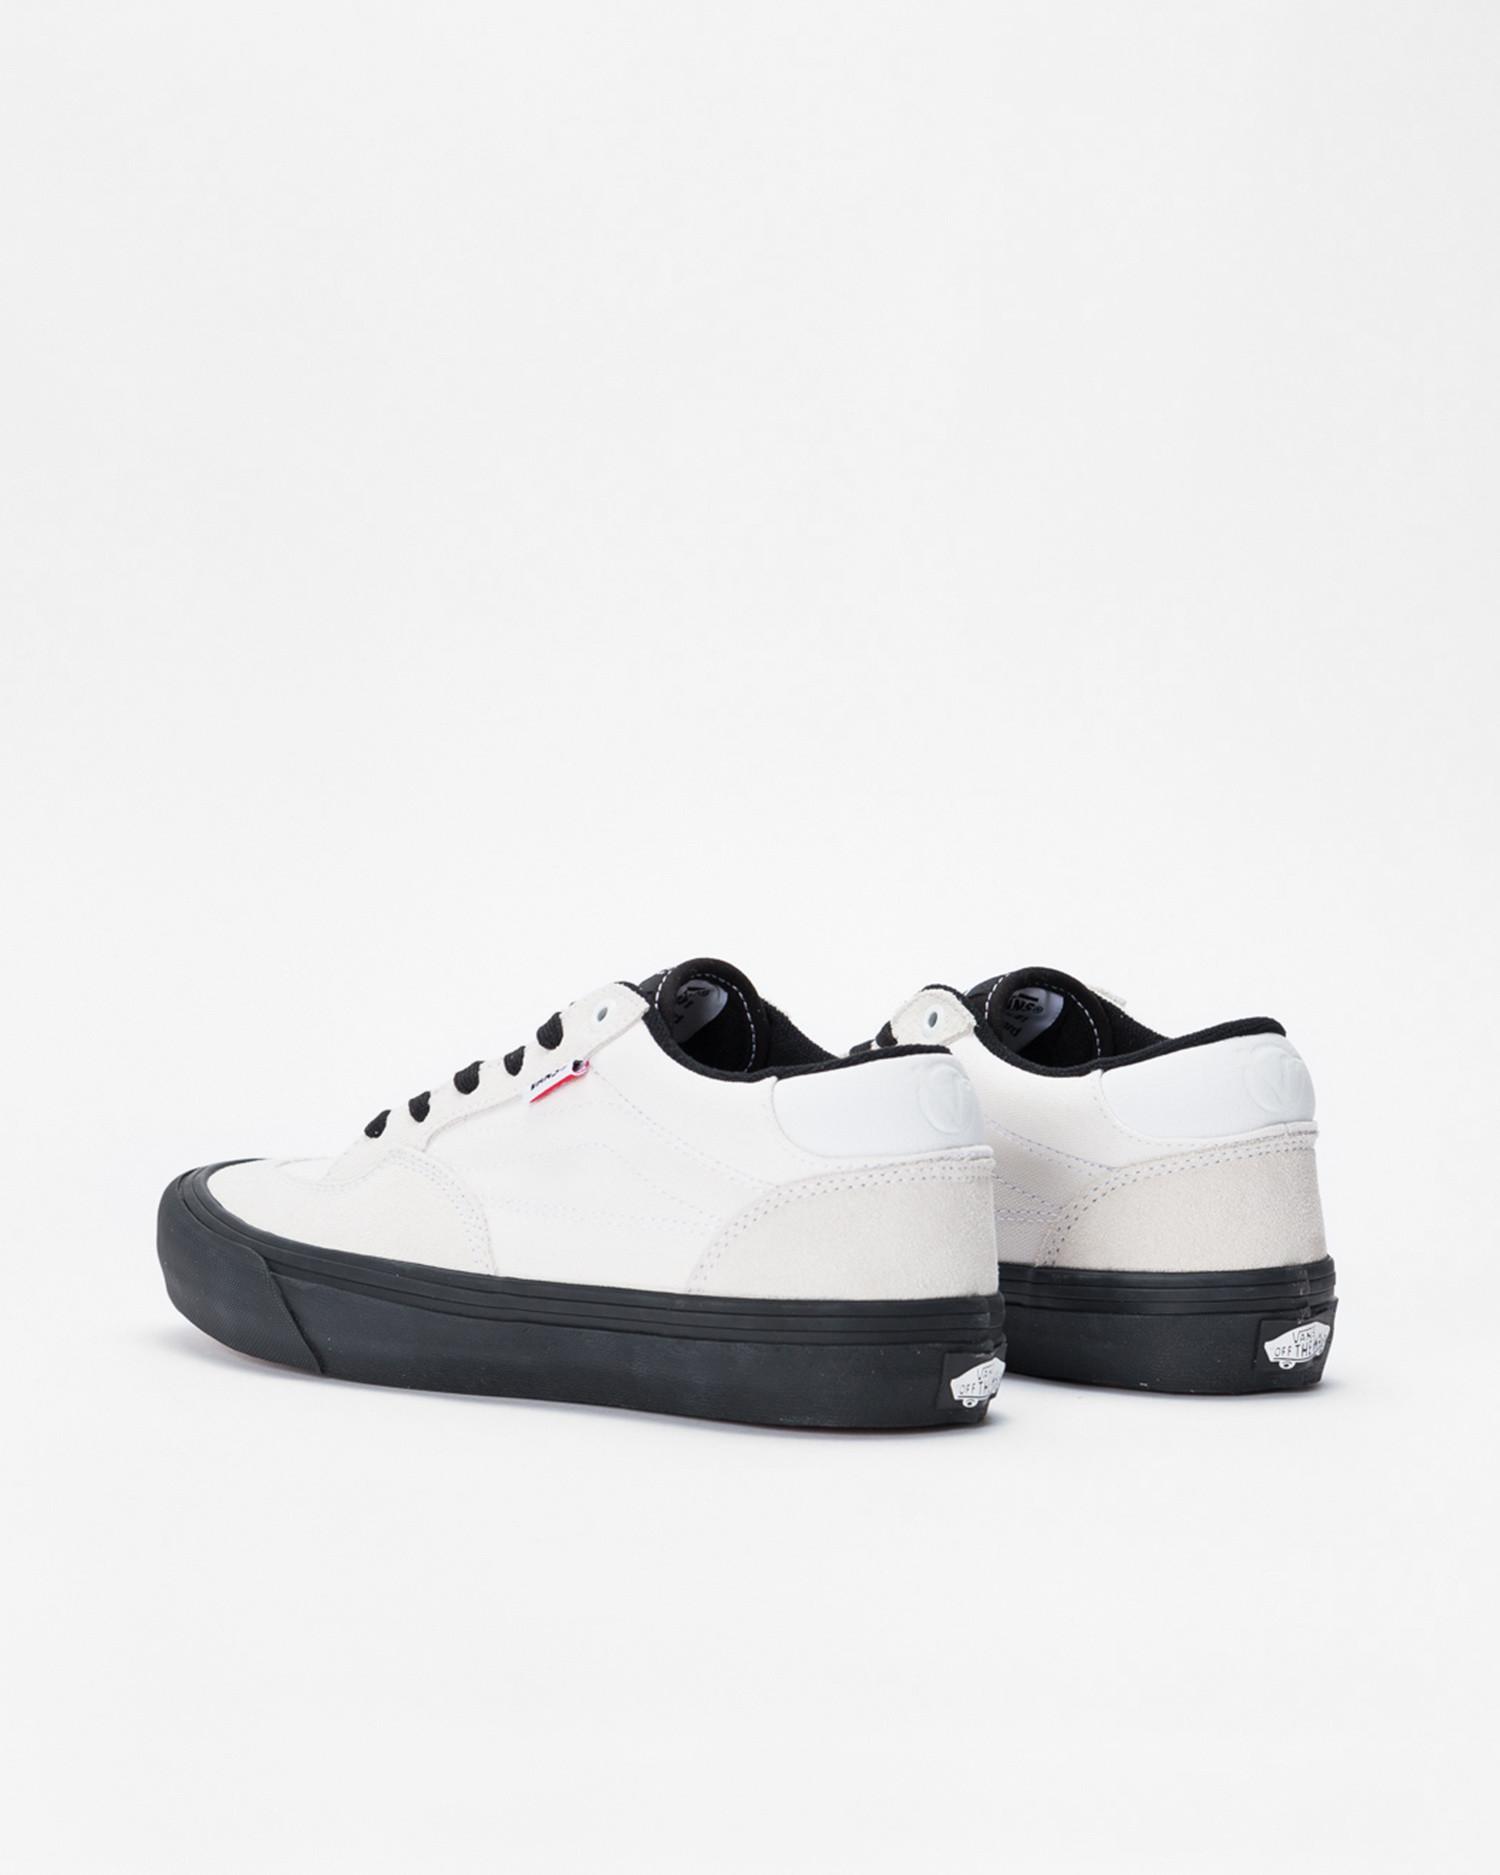 Vans Rowan Pro White/Black